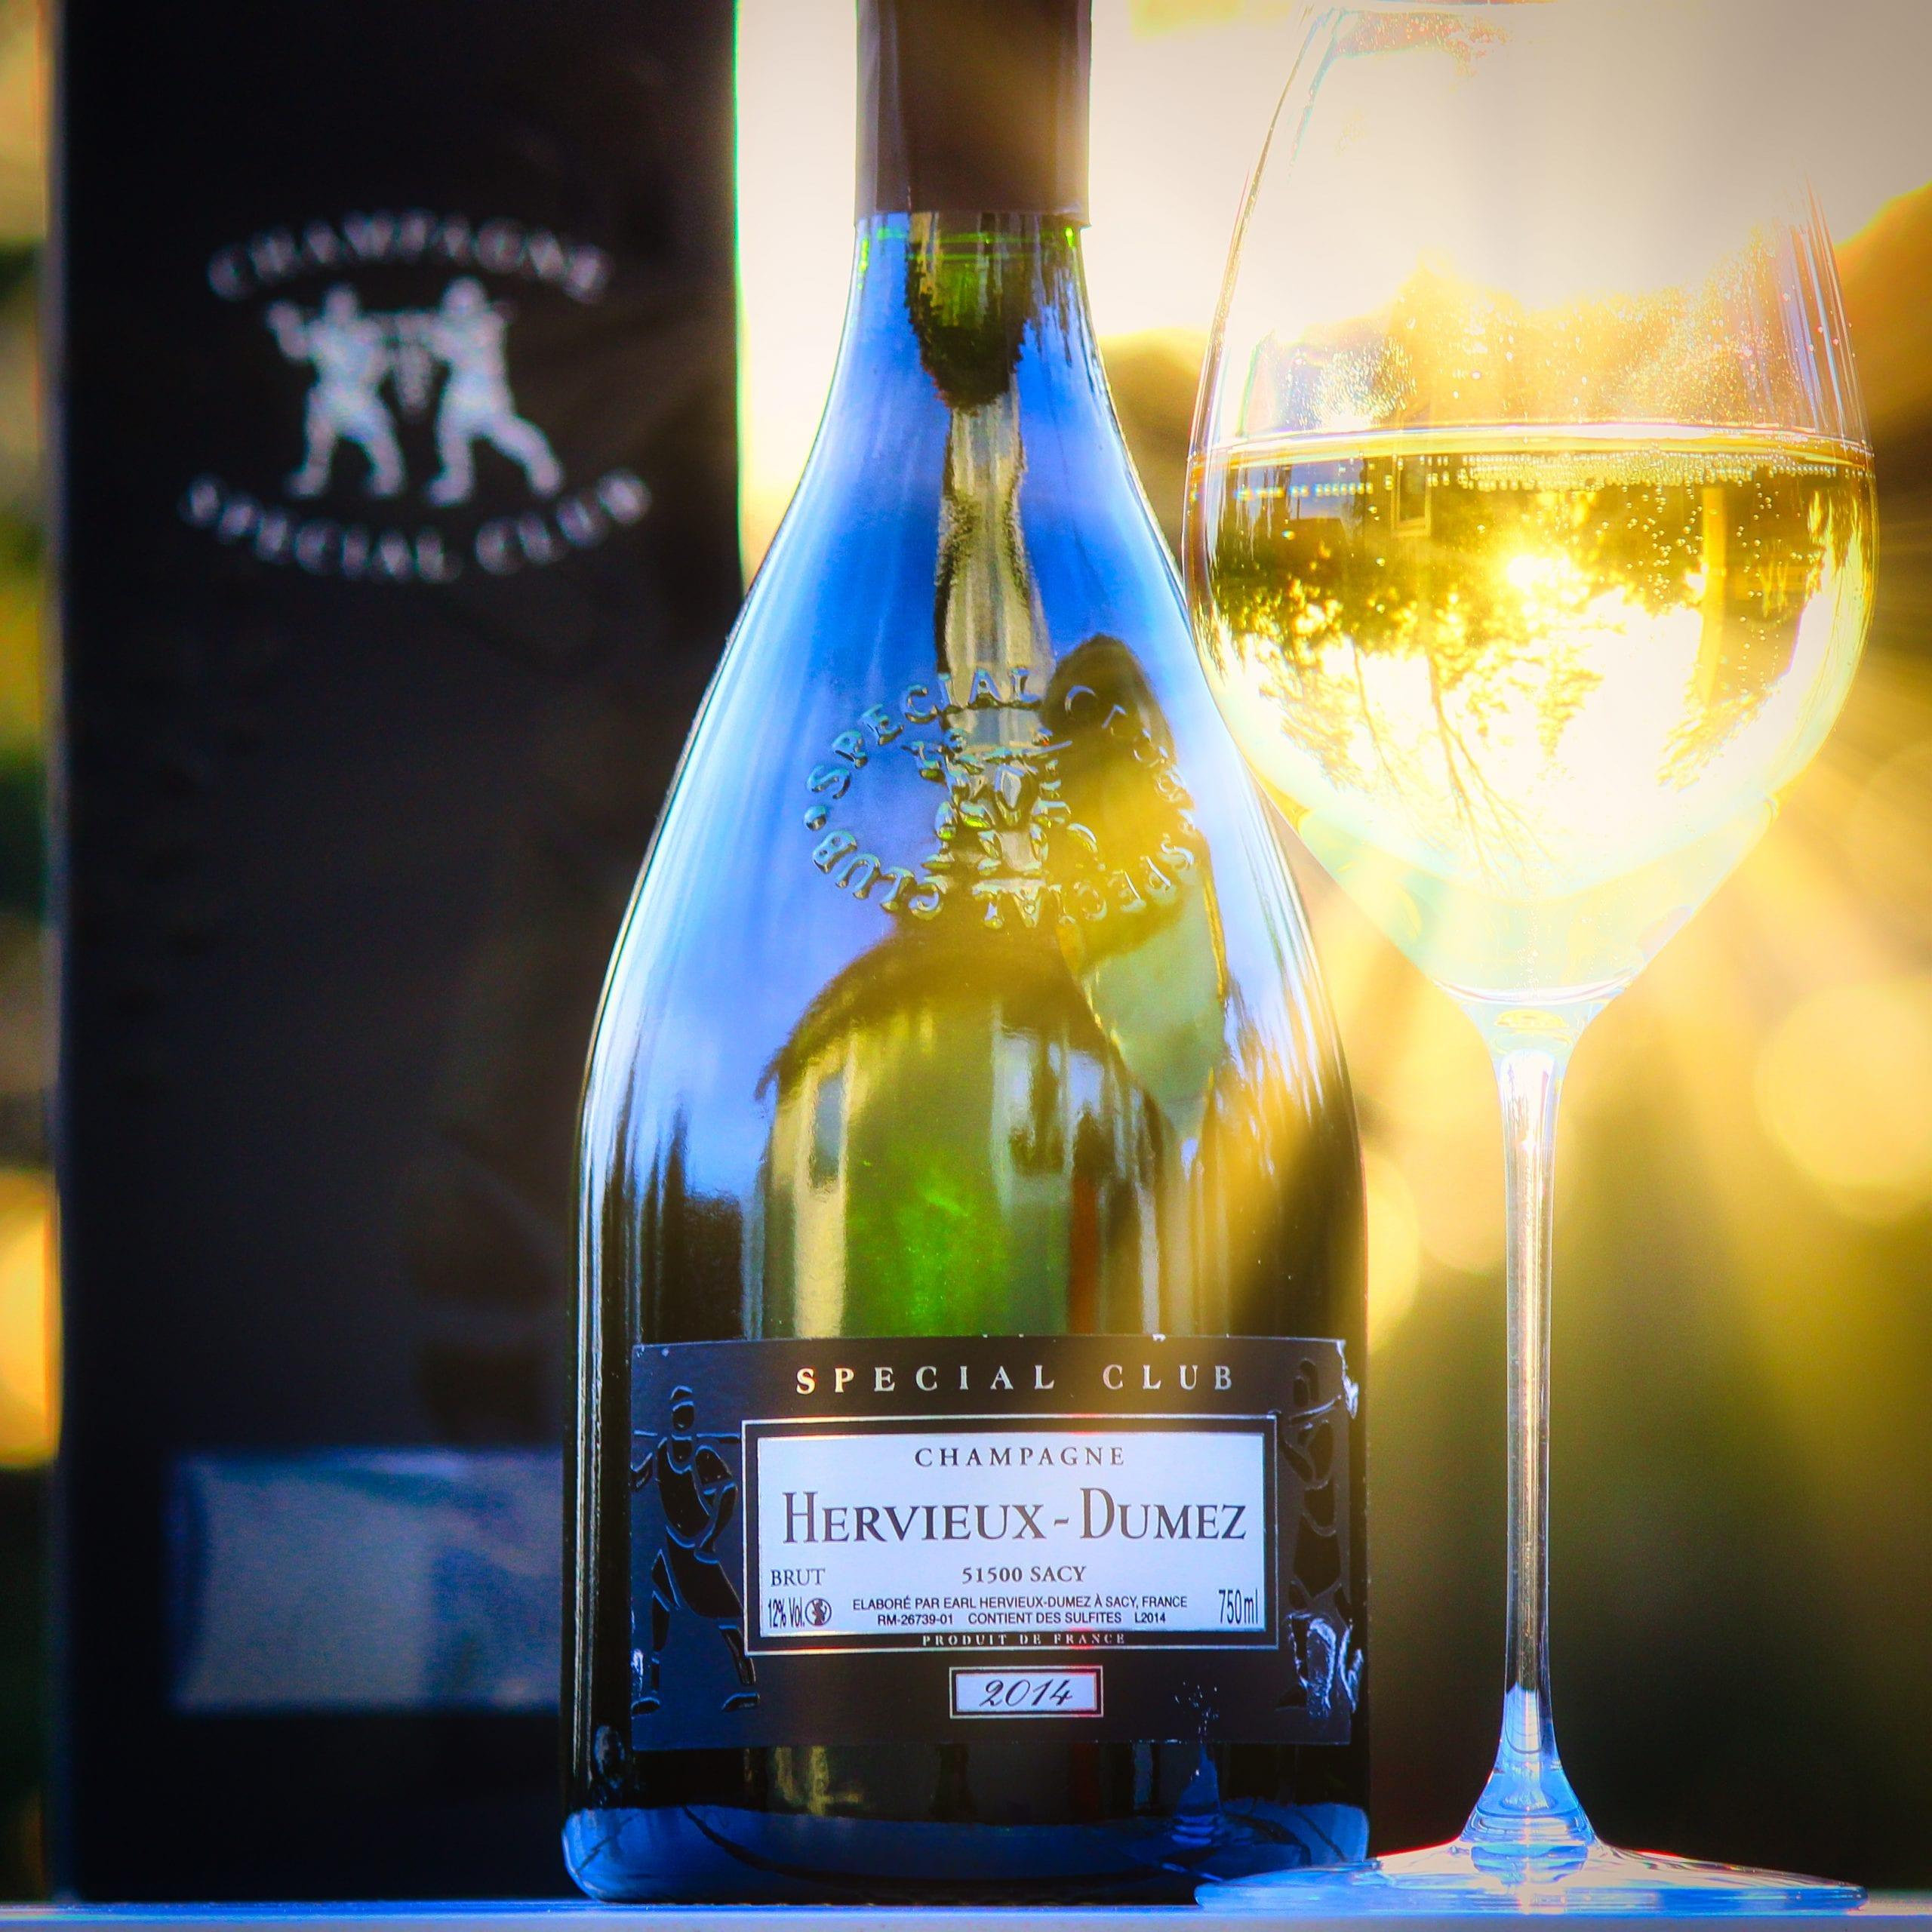 Hervieux-Dumez Special Club 2014